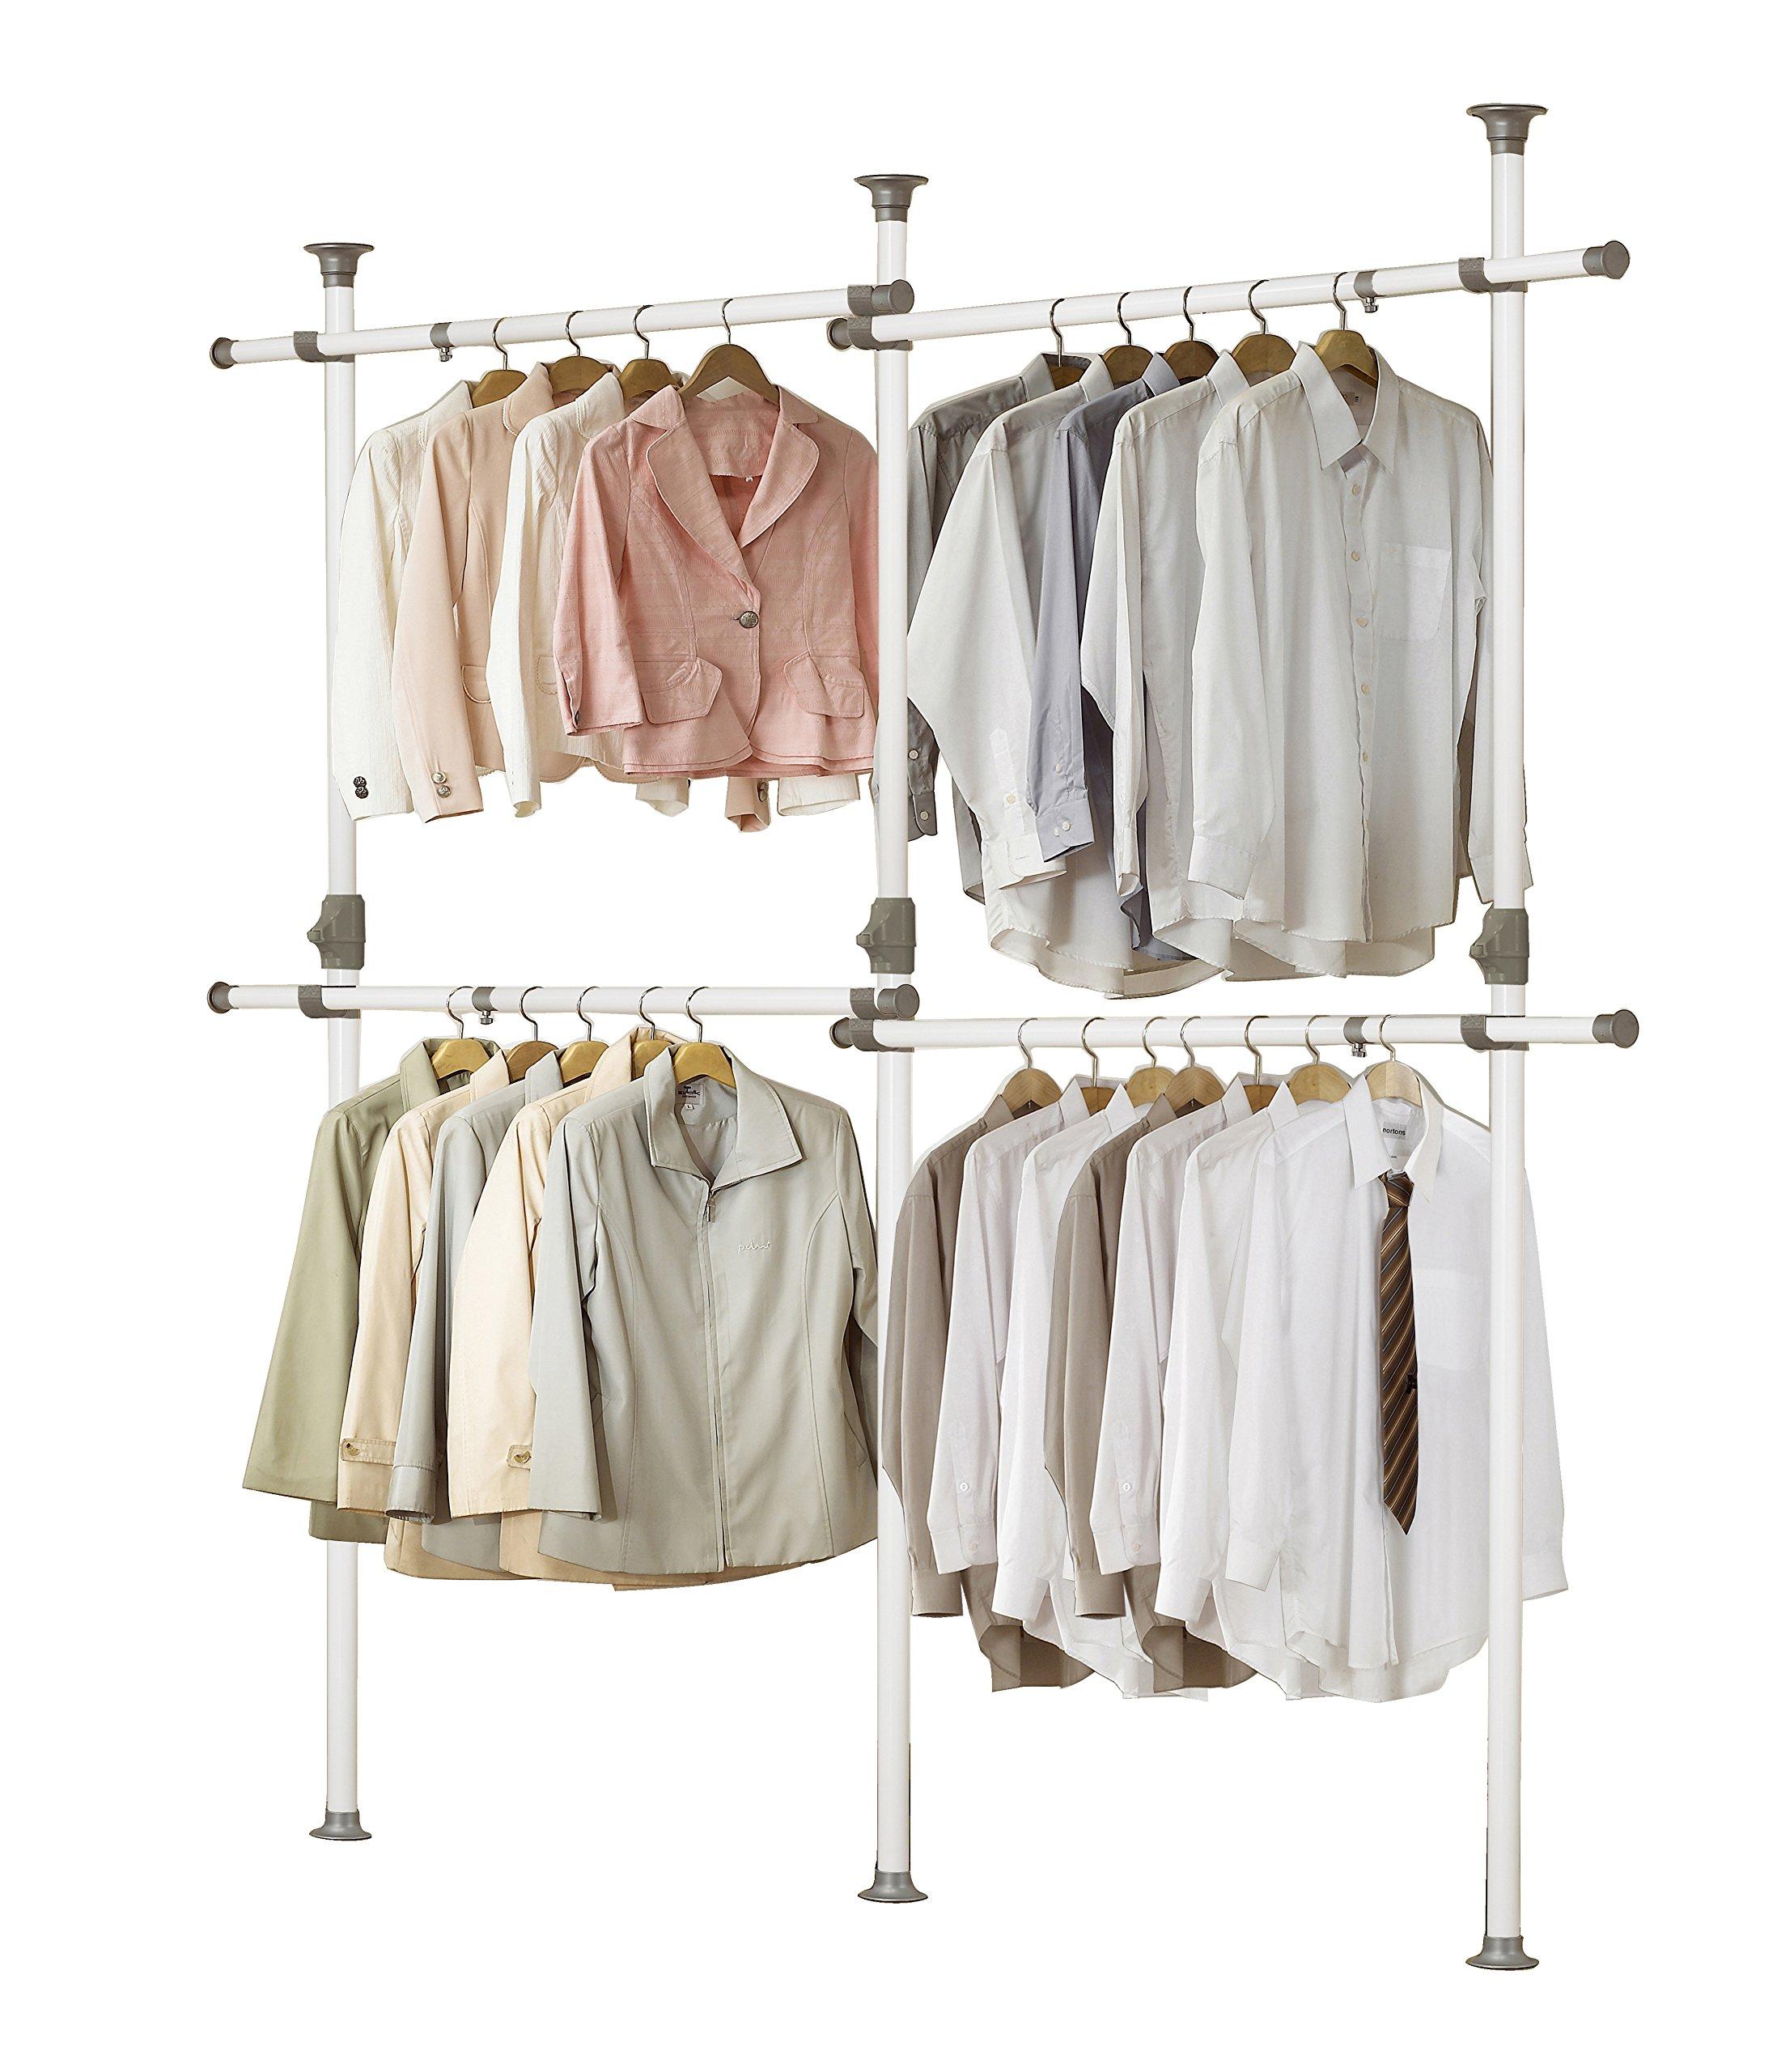 PRINCE HANGER | One Touch Double 2 Tier Adjustable Hanger | Holding 80kg(176LB) per horizontal bar | Clothing Rack | Closet Organizer | 38mm Vertical pole | Heavy Duty | Garment Rack | PHUS-0033